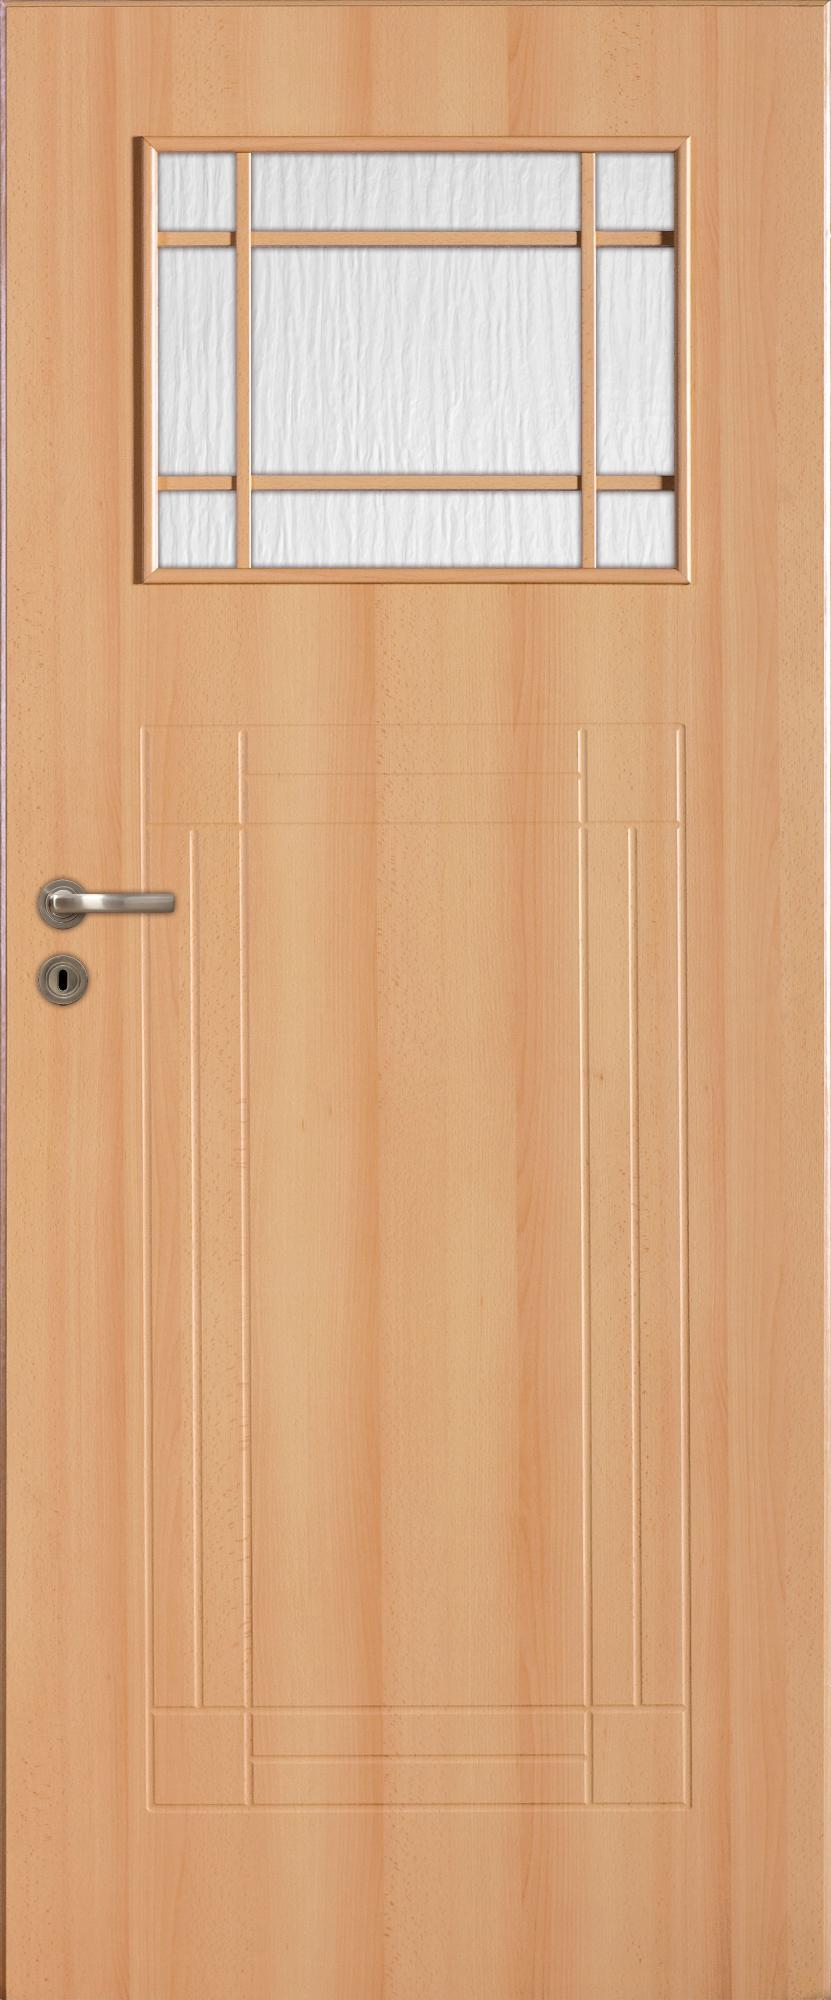 Interiérové dveře DRE Linea 20s